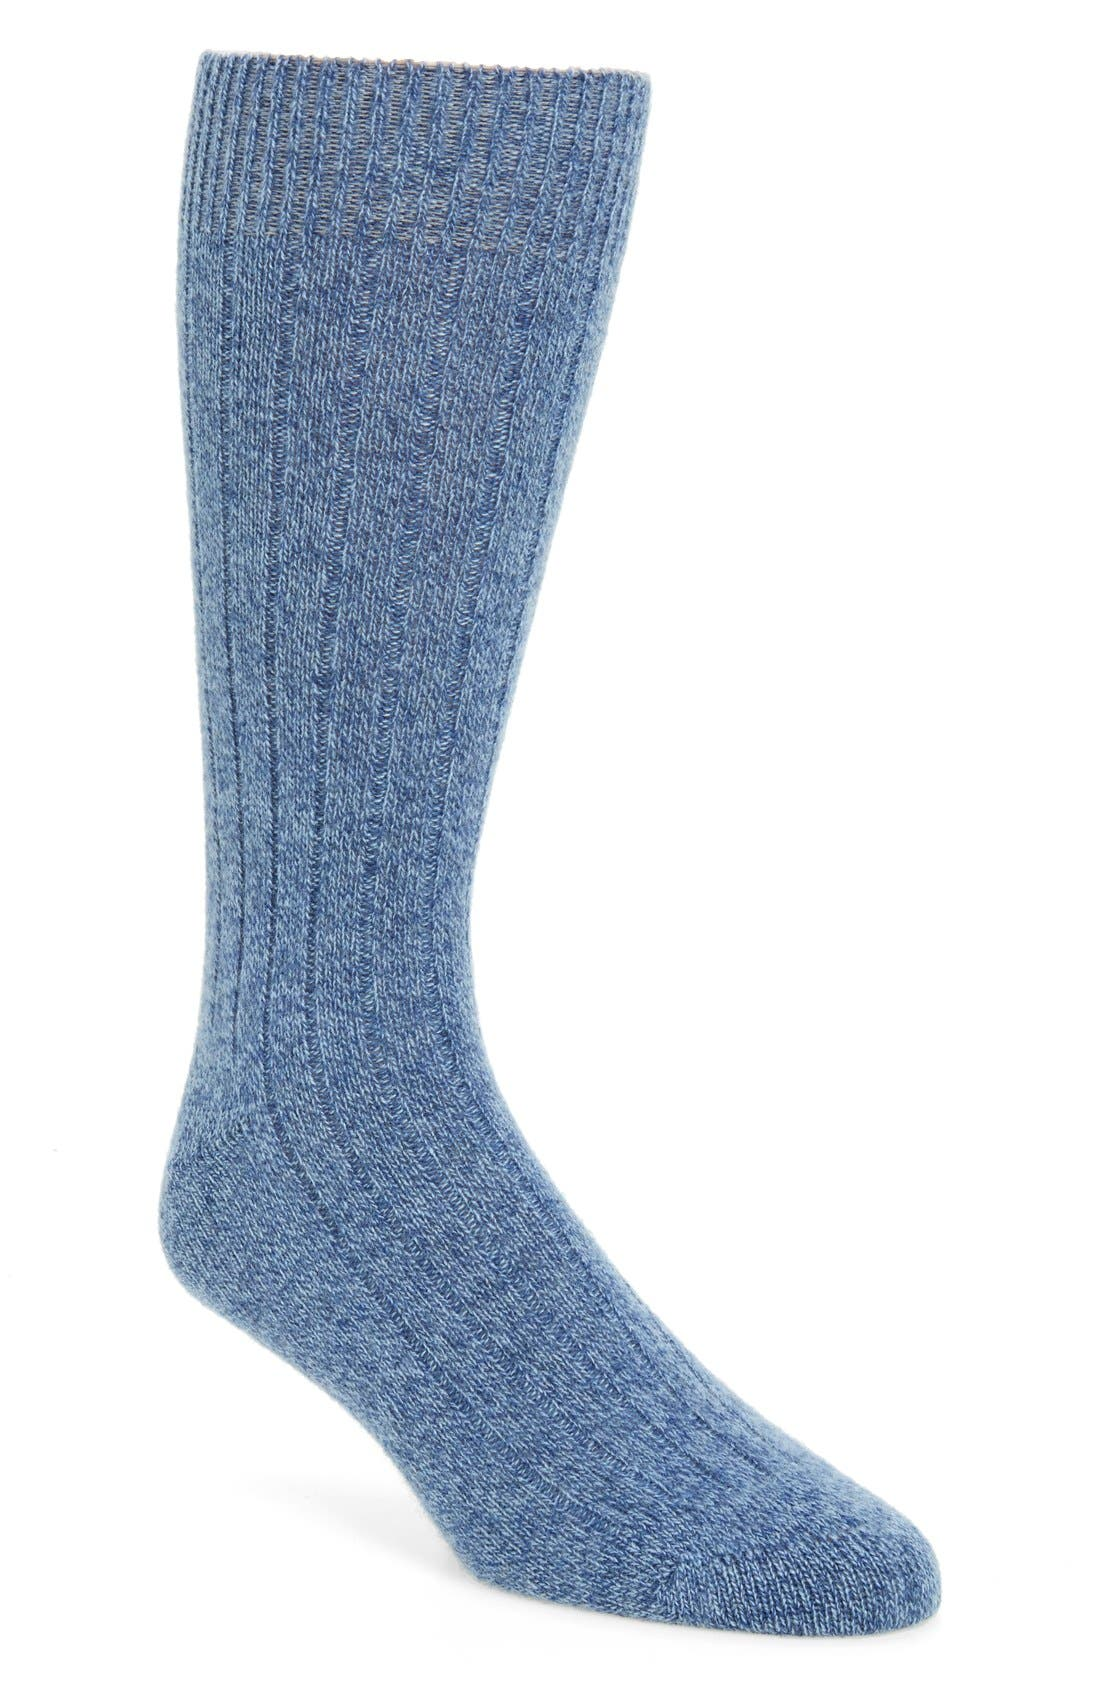 'Waddington' Cashmere Blend Mid Calf Socks,                             Main thumbnail 8, color,